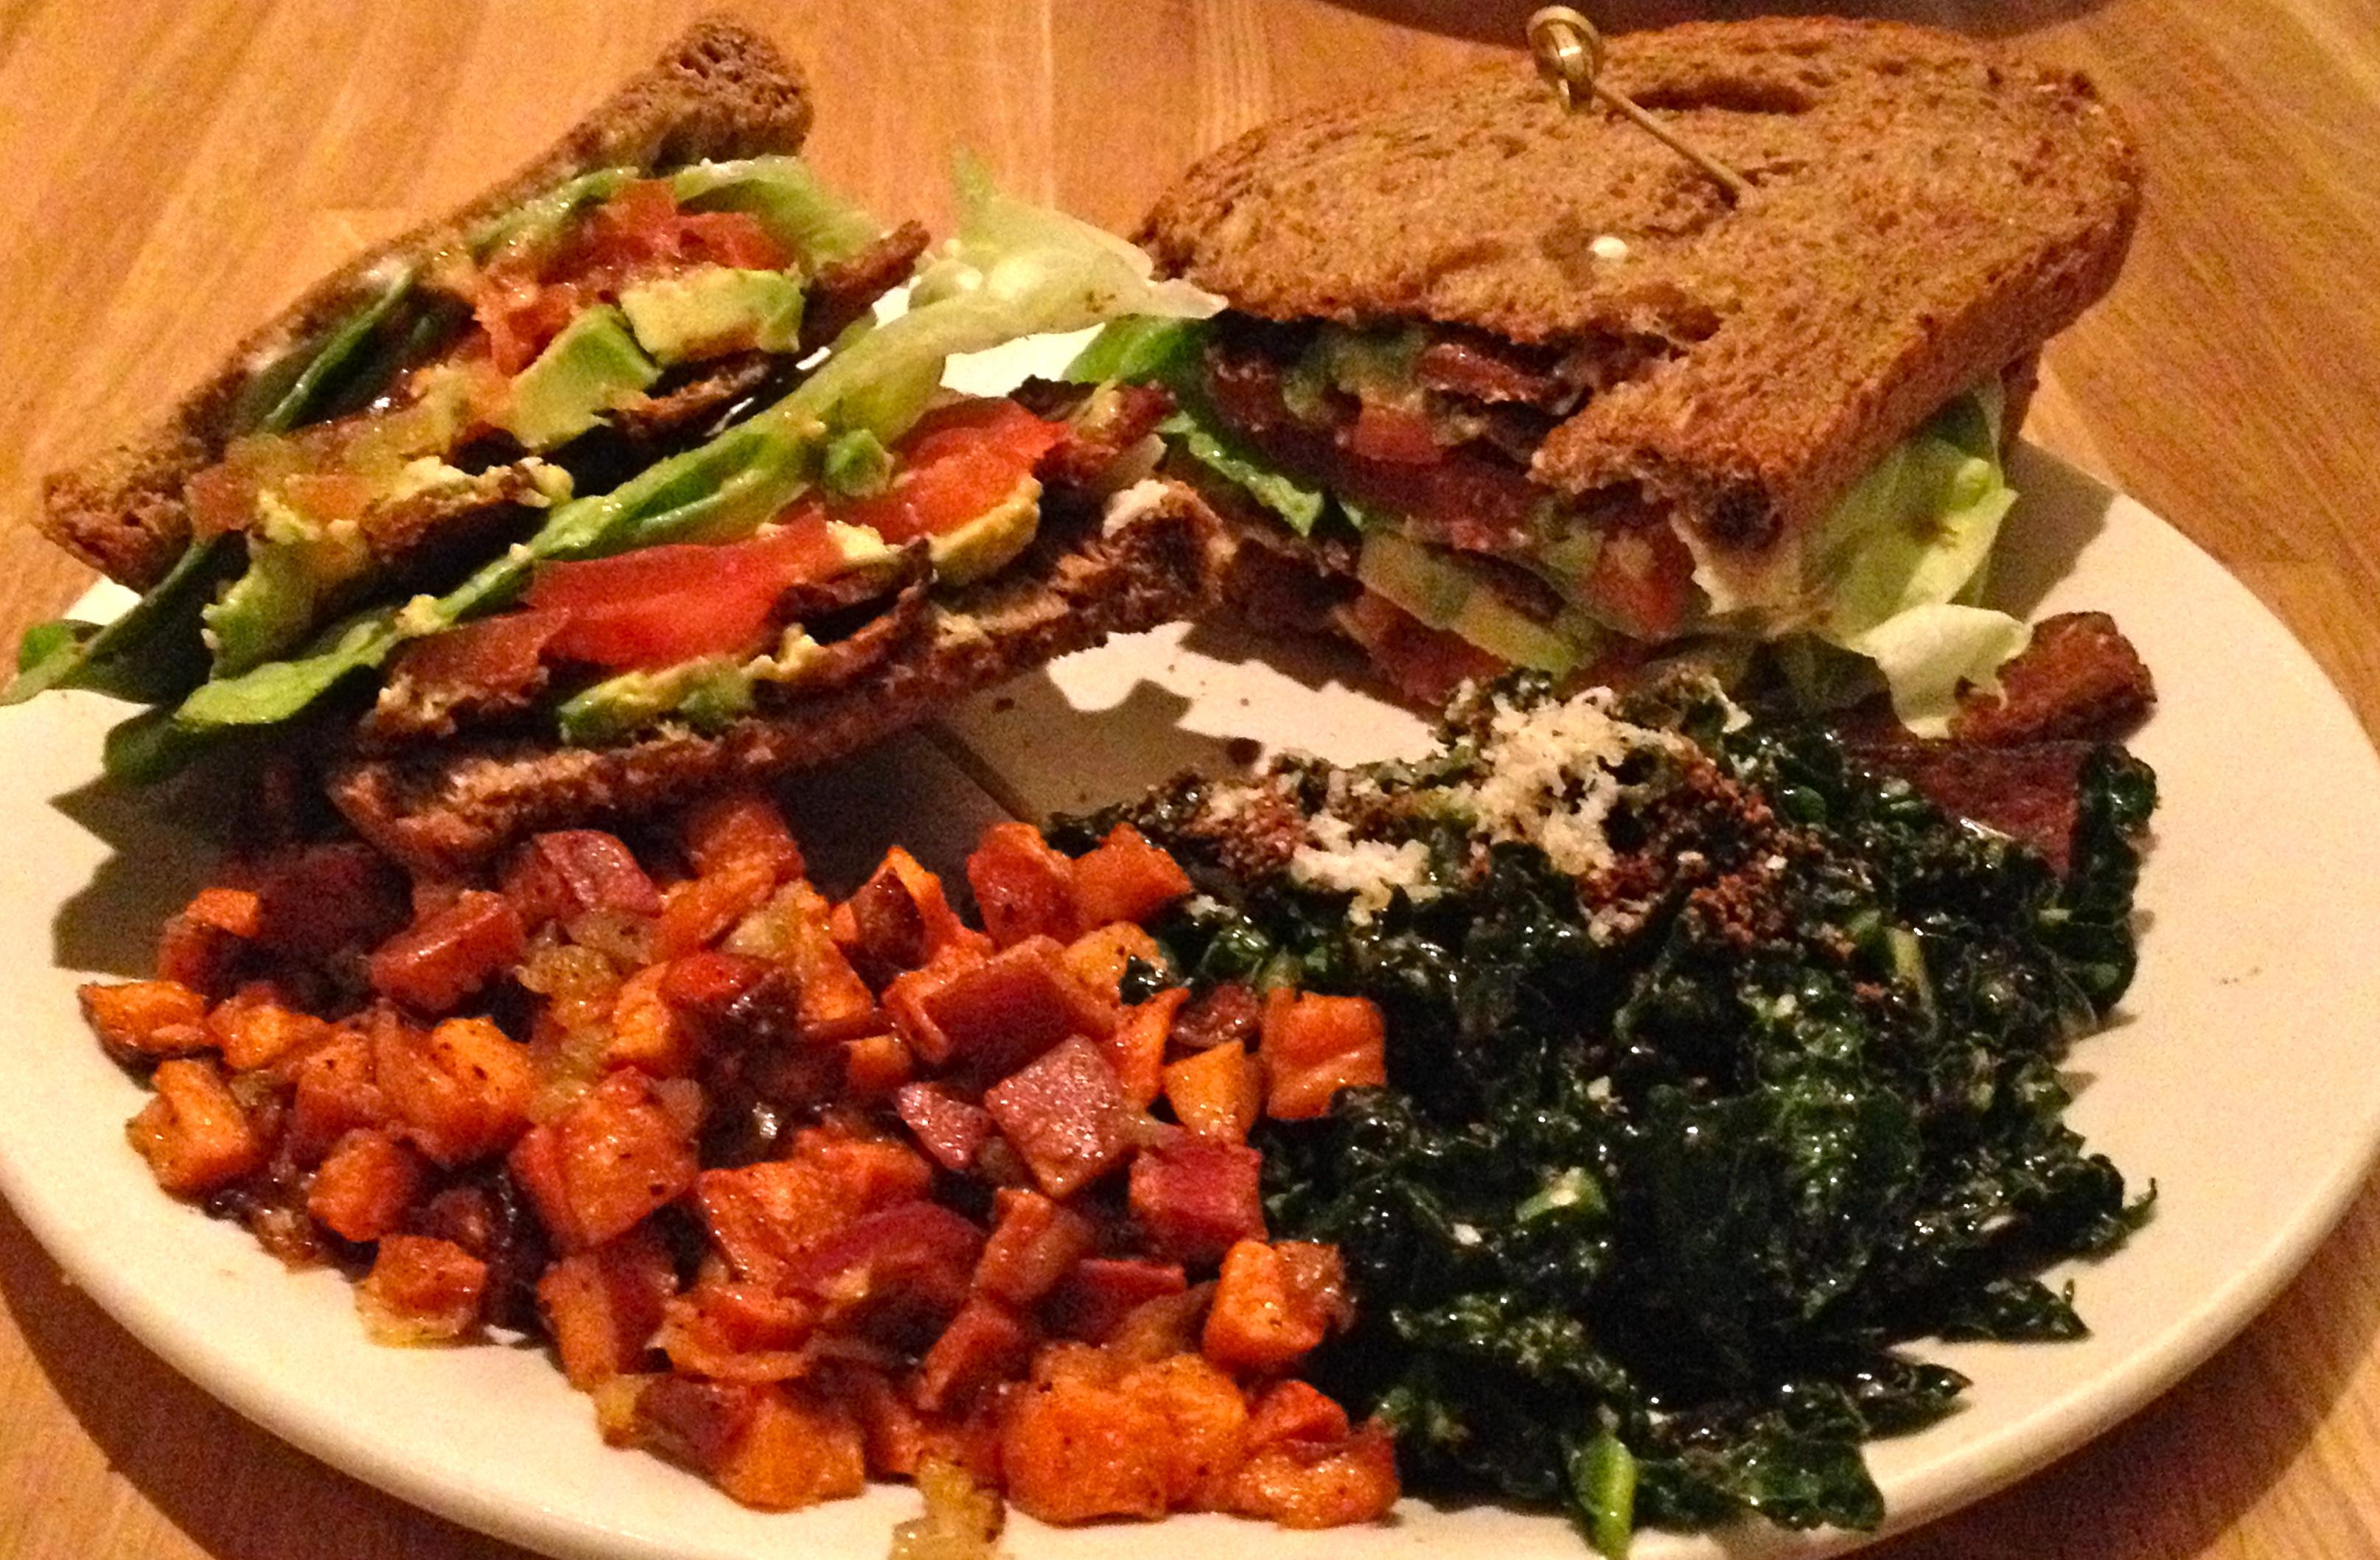 True Food Kitchen: Vegan Friendly   The Fussy Fork